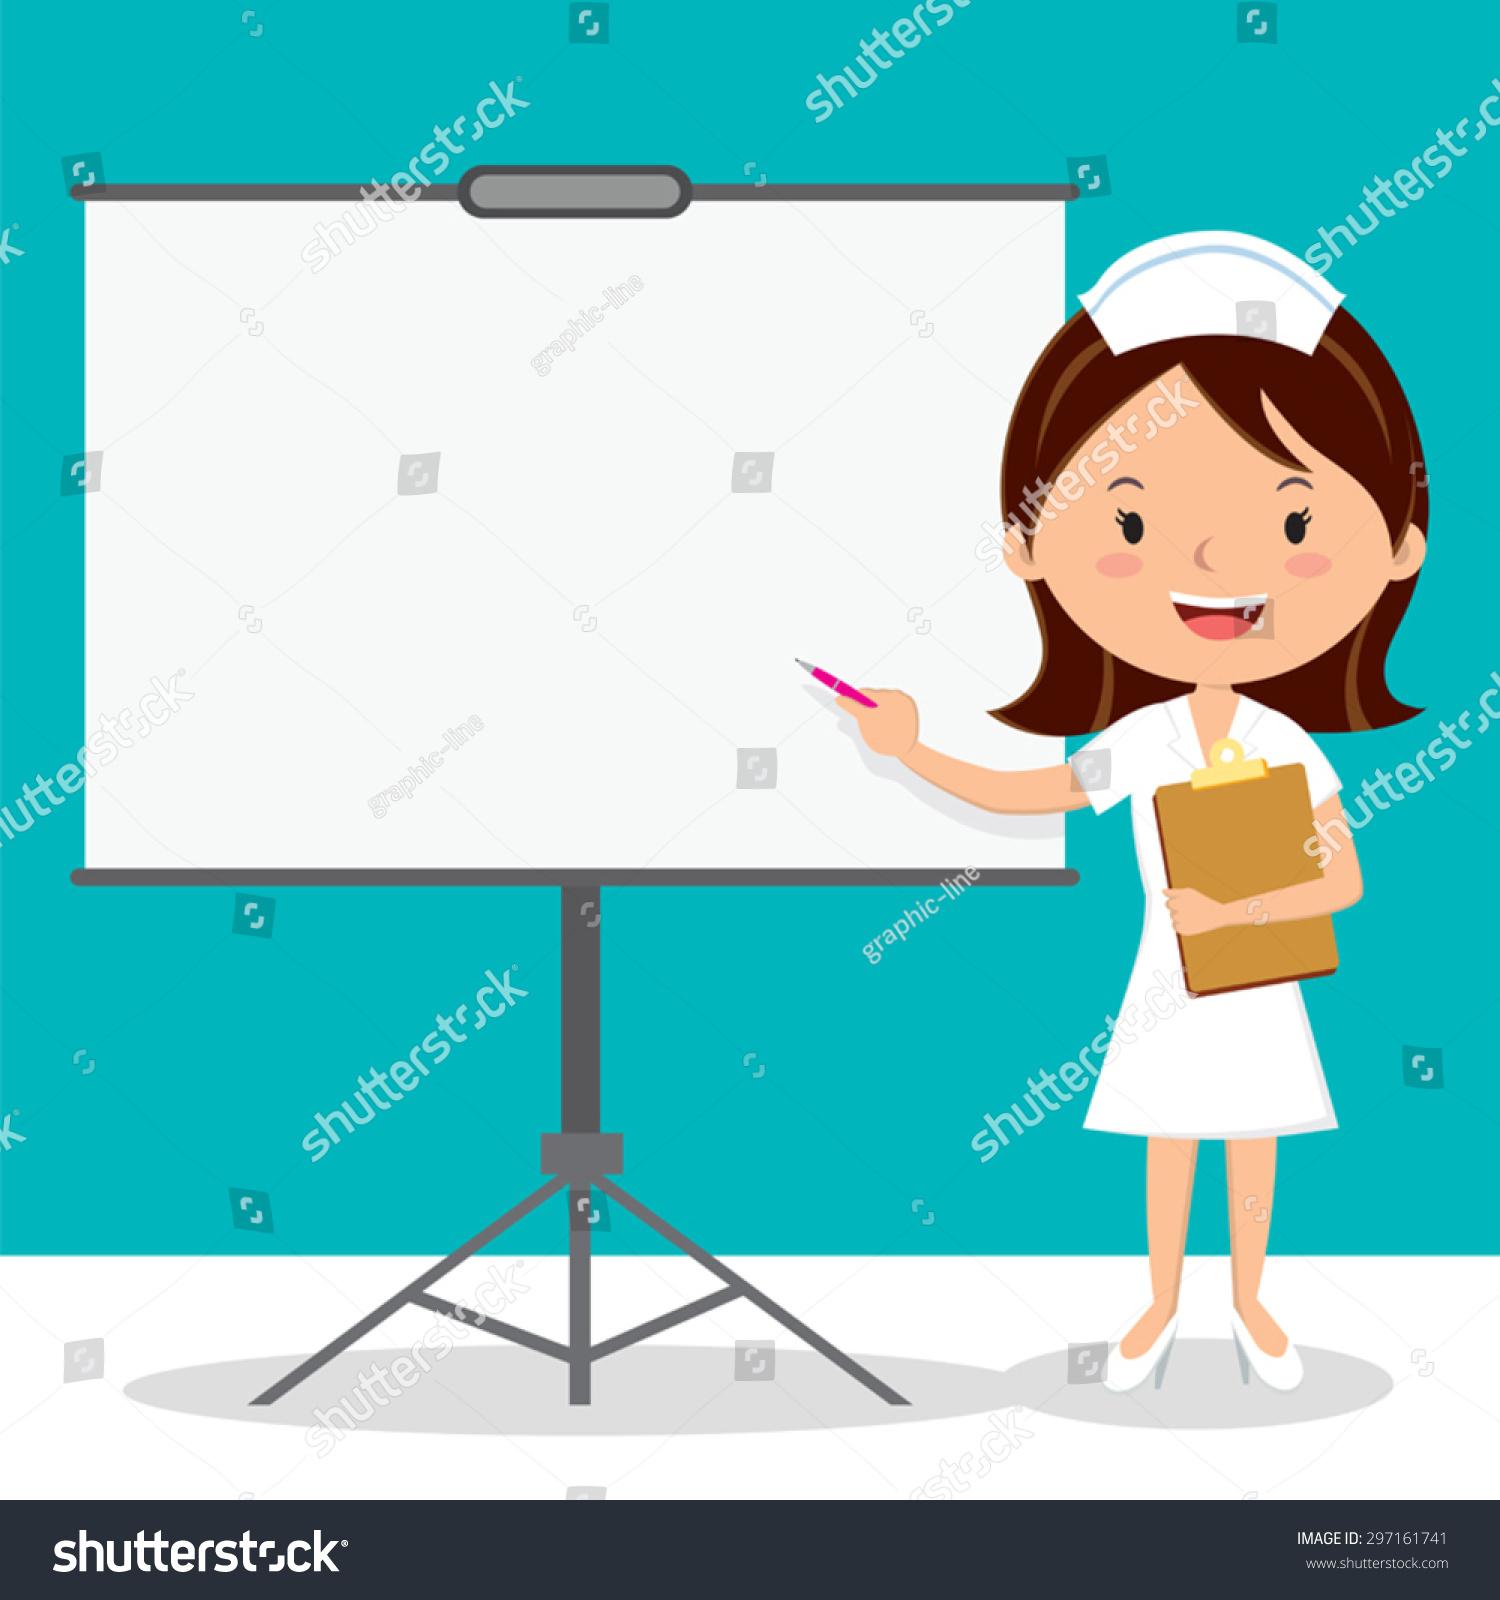 presentation of phaedra and nurse in Phaedra as a tragic heroine in jean racine's phaedra topics: tragedy class civ discuss the presentation of phaedra and nurse in hippolytus.